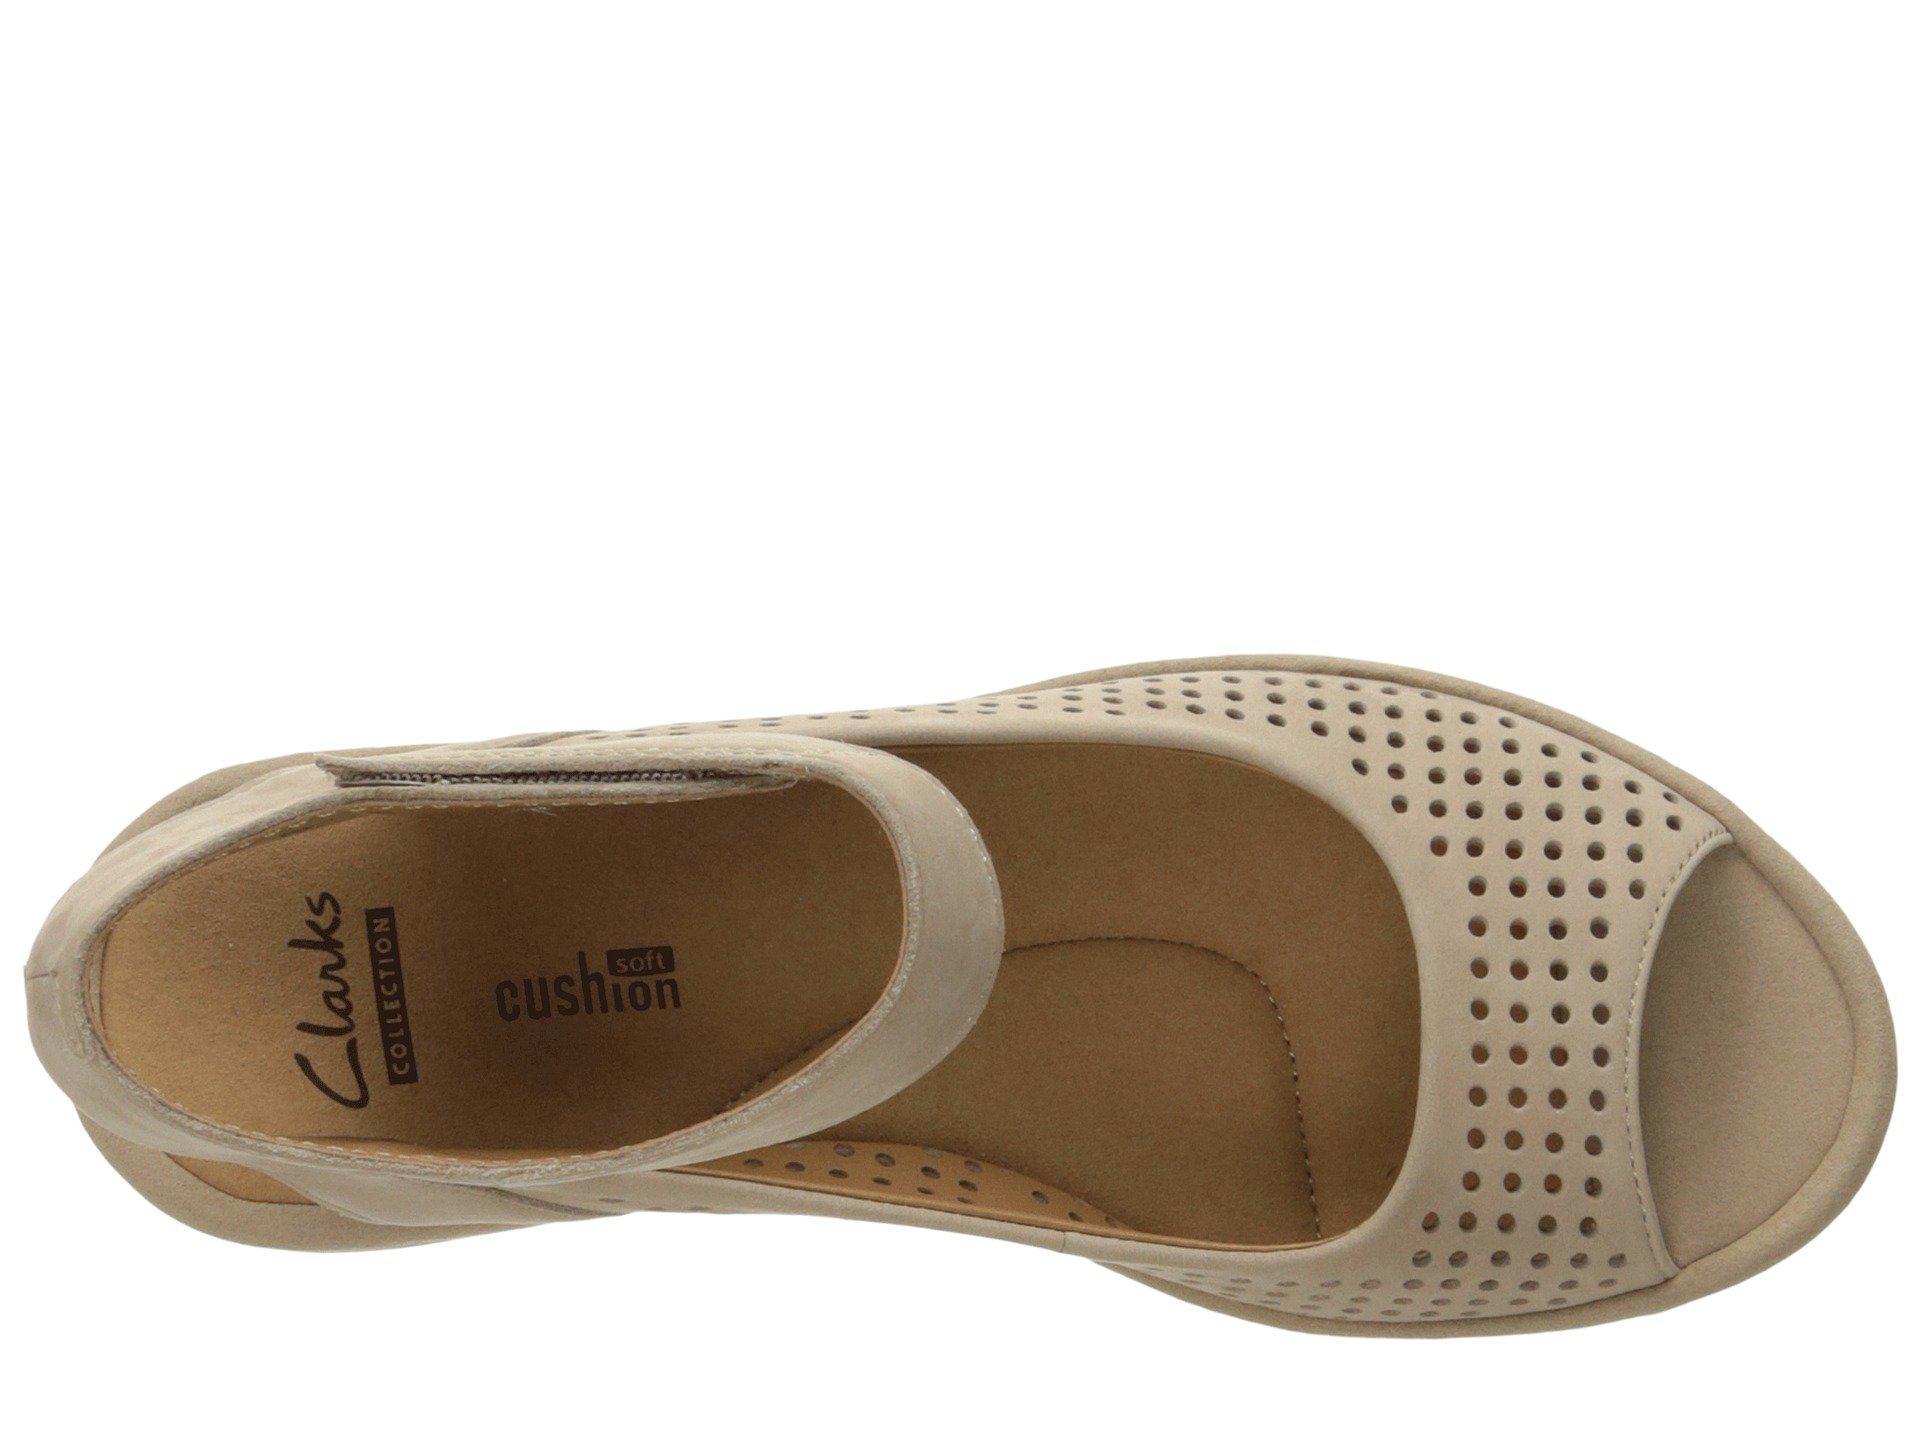 8f94133fff1 Clarks - Multicolor Reedly Salene (sand Nubuck) Women s Sandals - Lyst.  View fullscreen